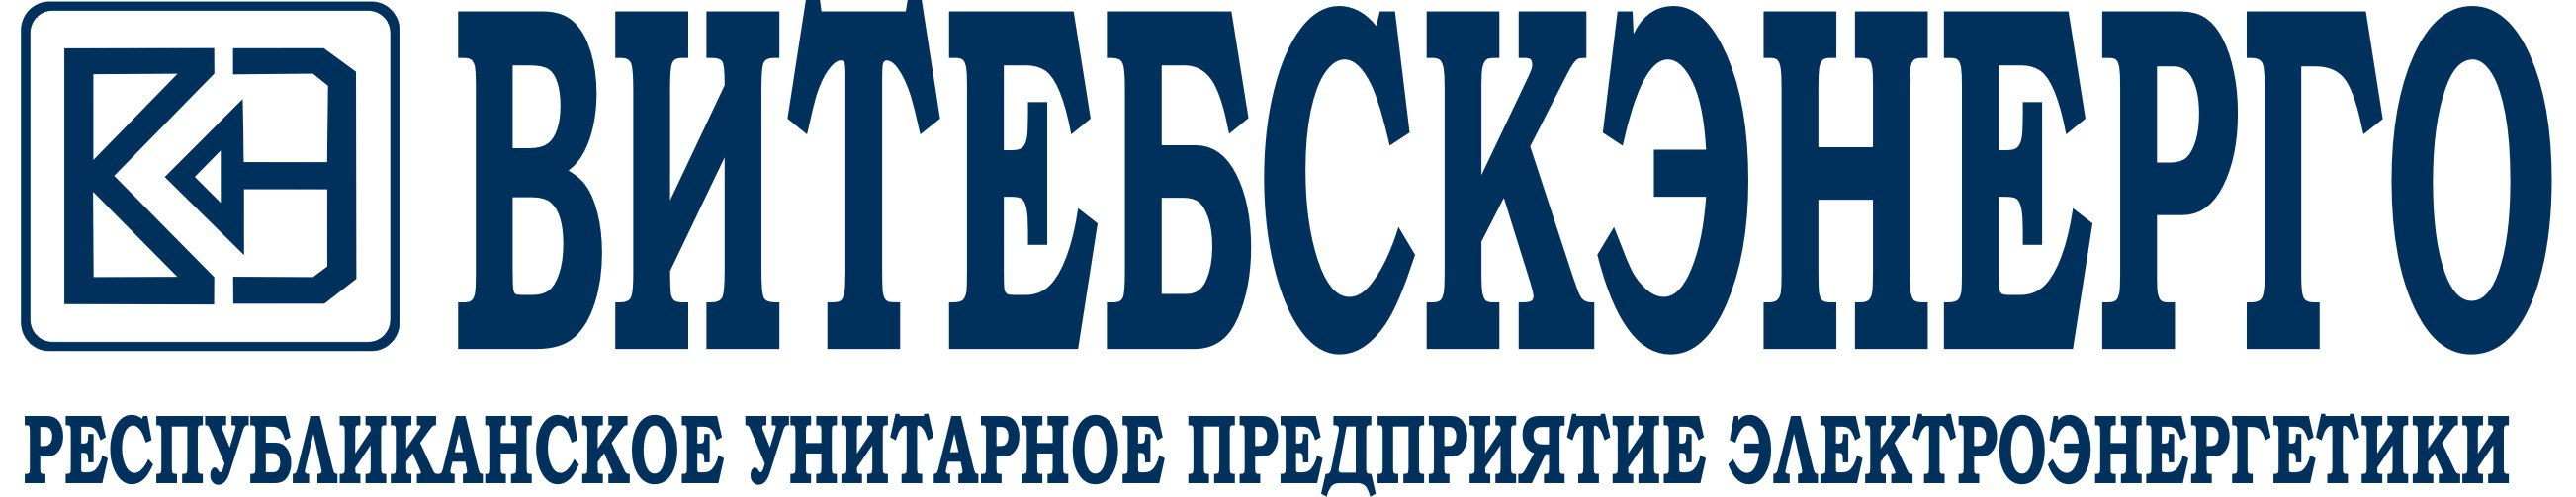 Витебскэнерго